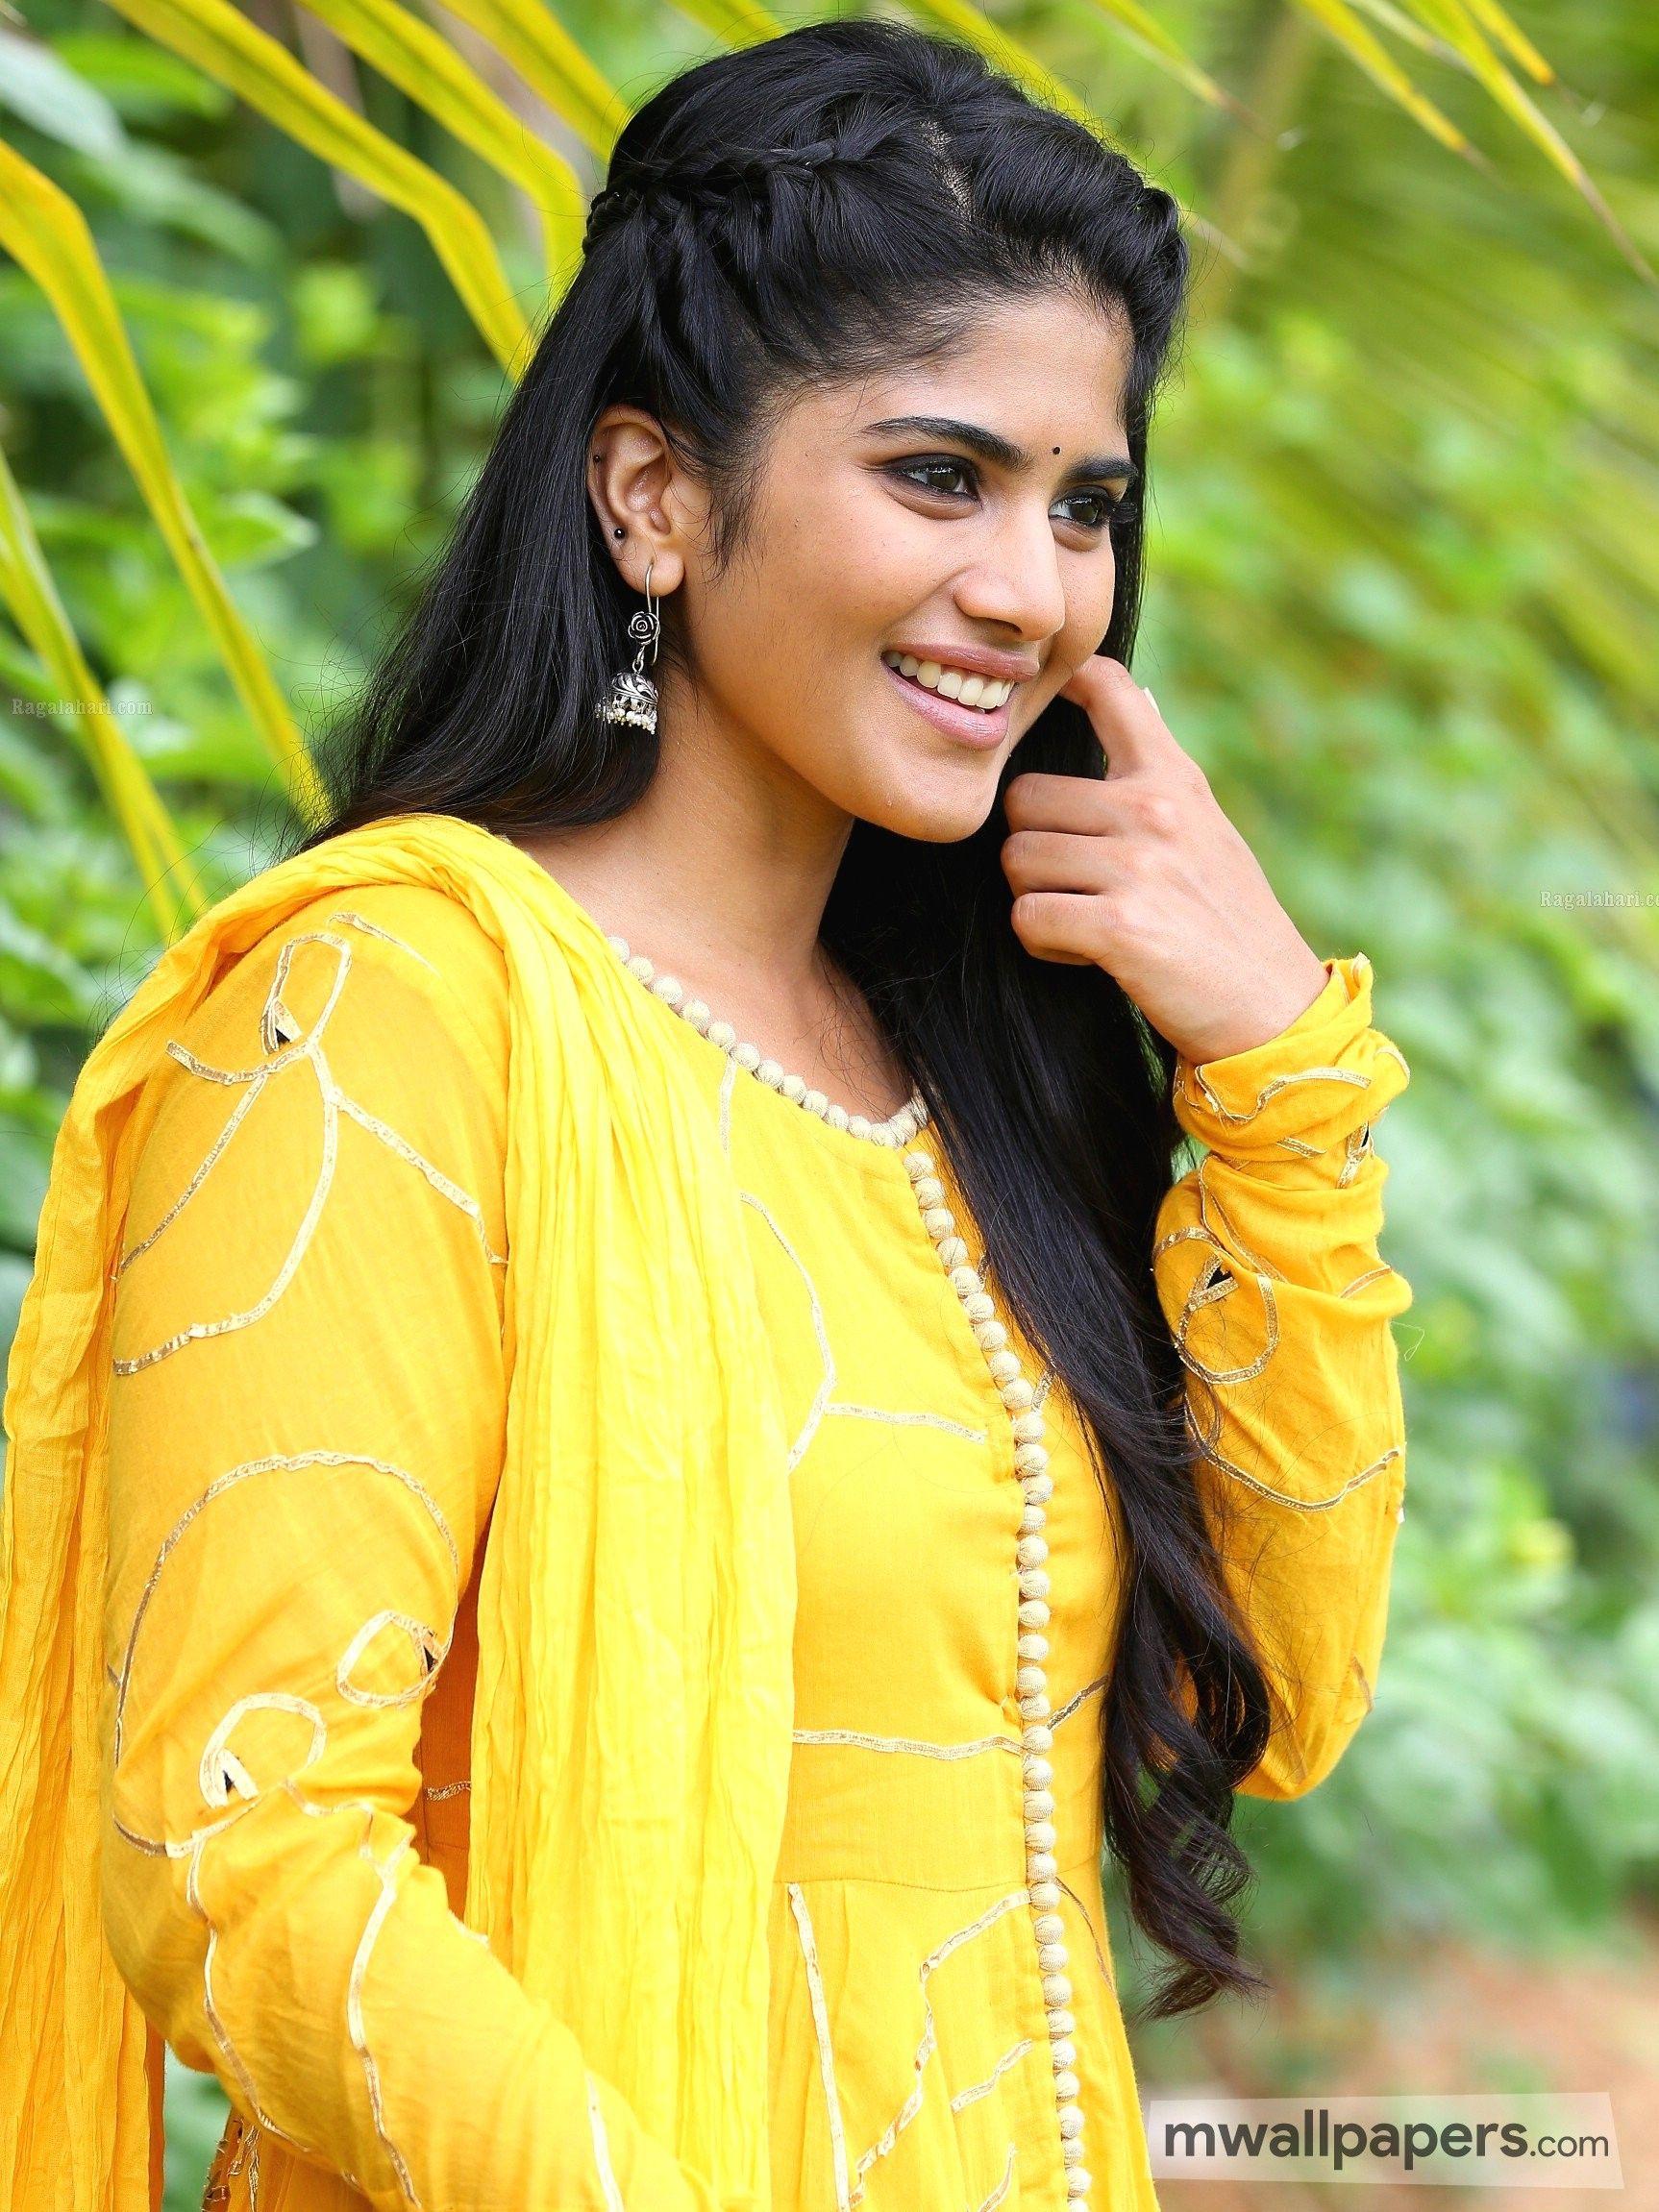 Megha Akash HD Image Wallpapers   1113 meghaakash tollywood 1726x2302